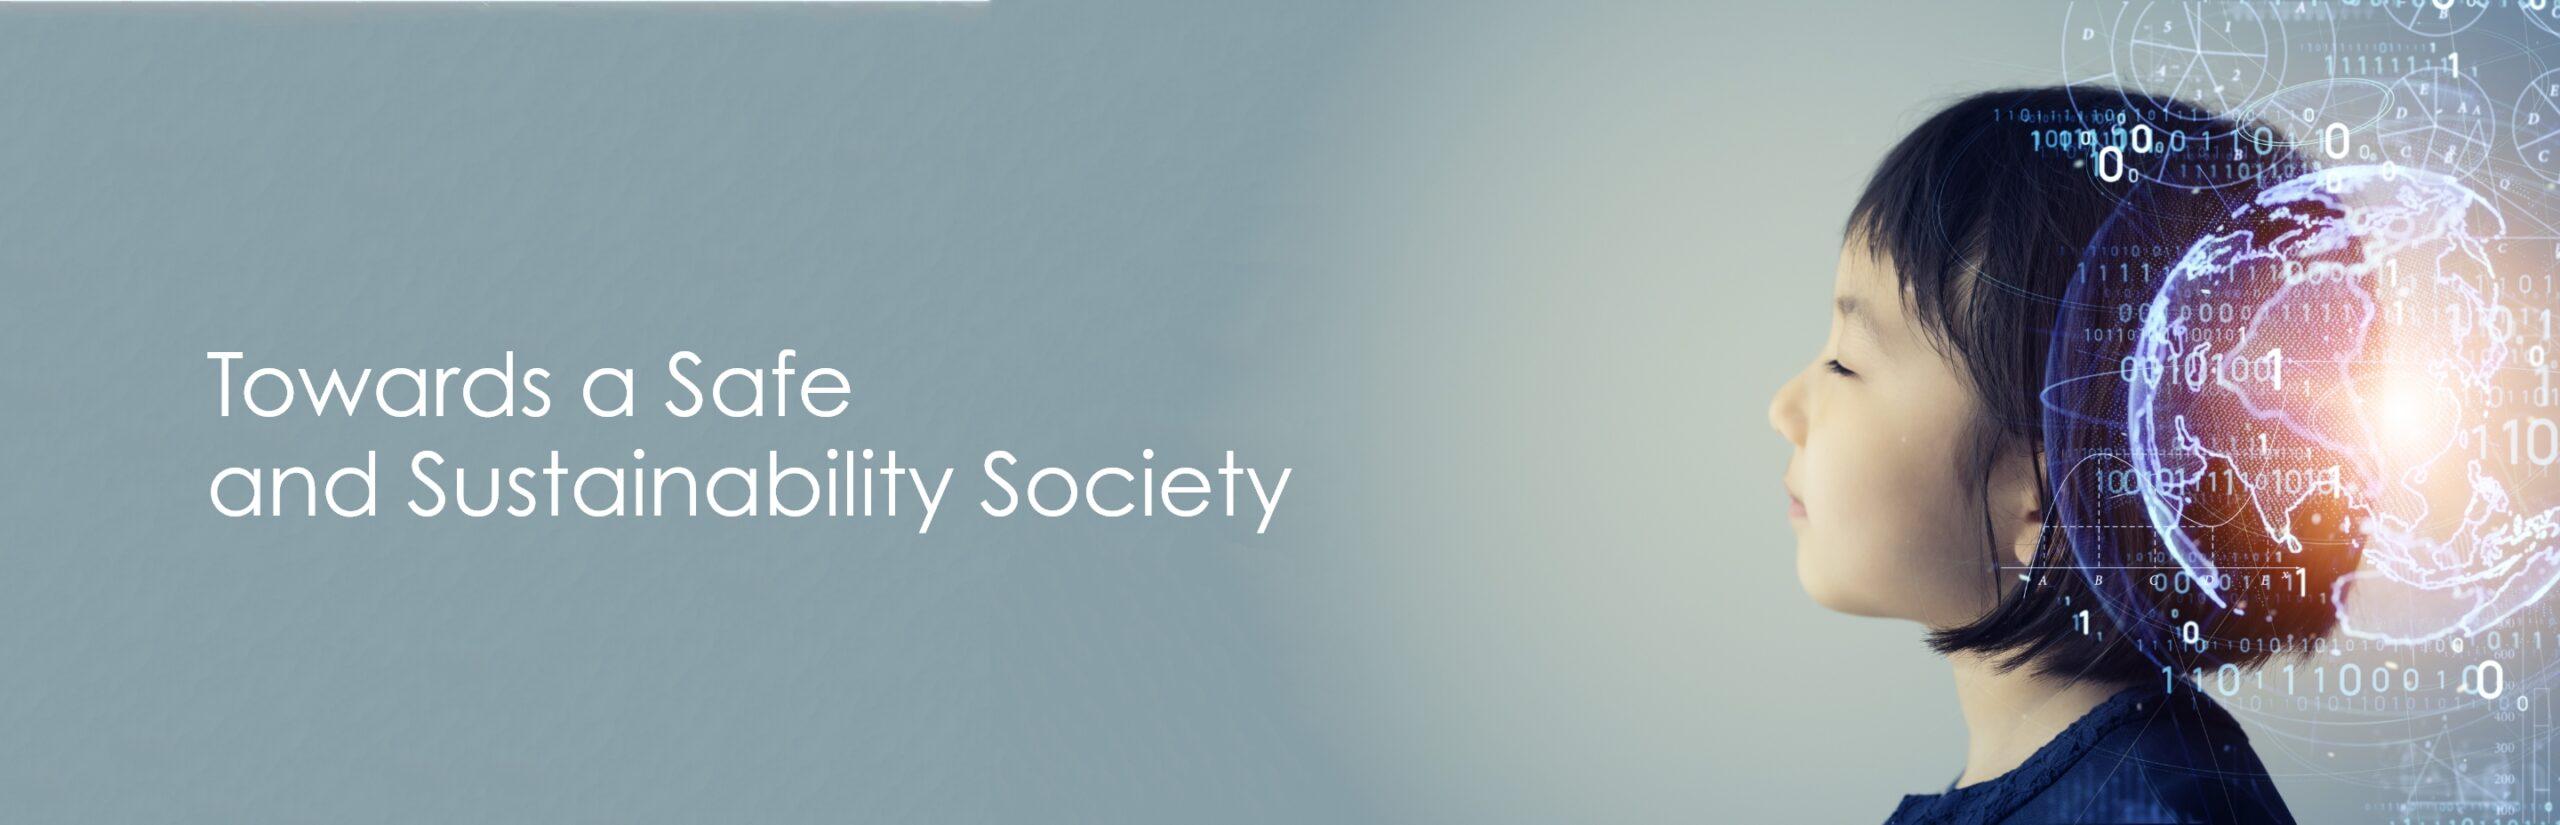 Towards a Safe and Sustainability Society